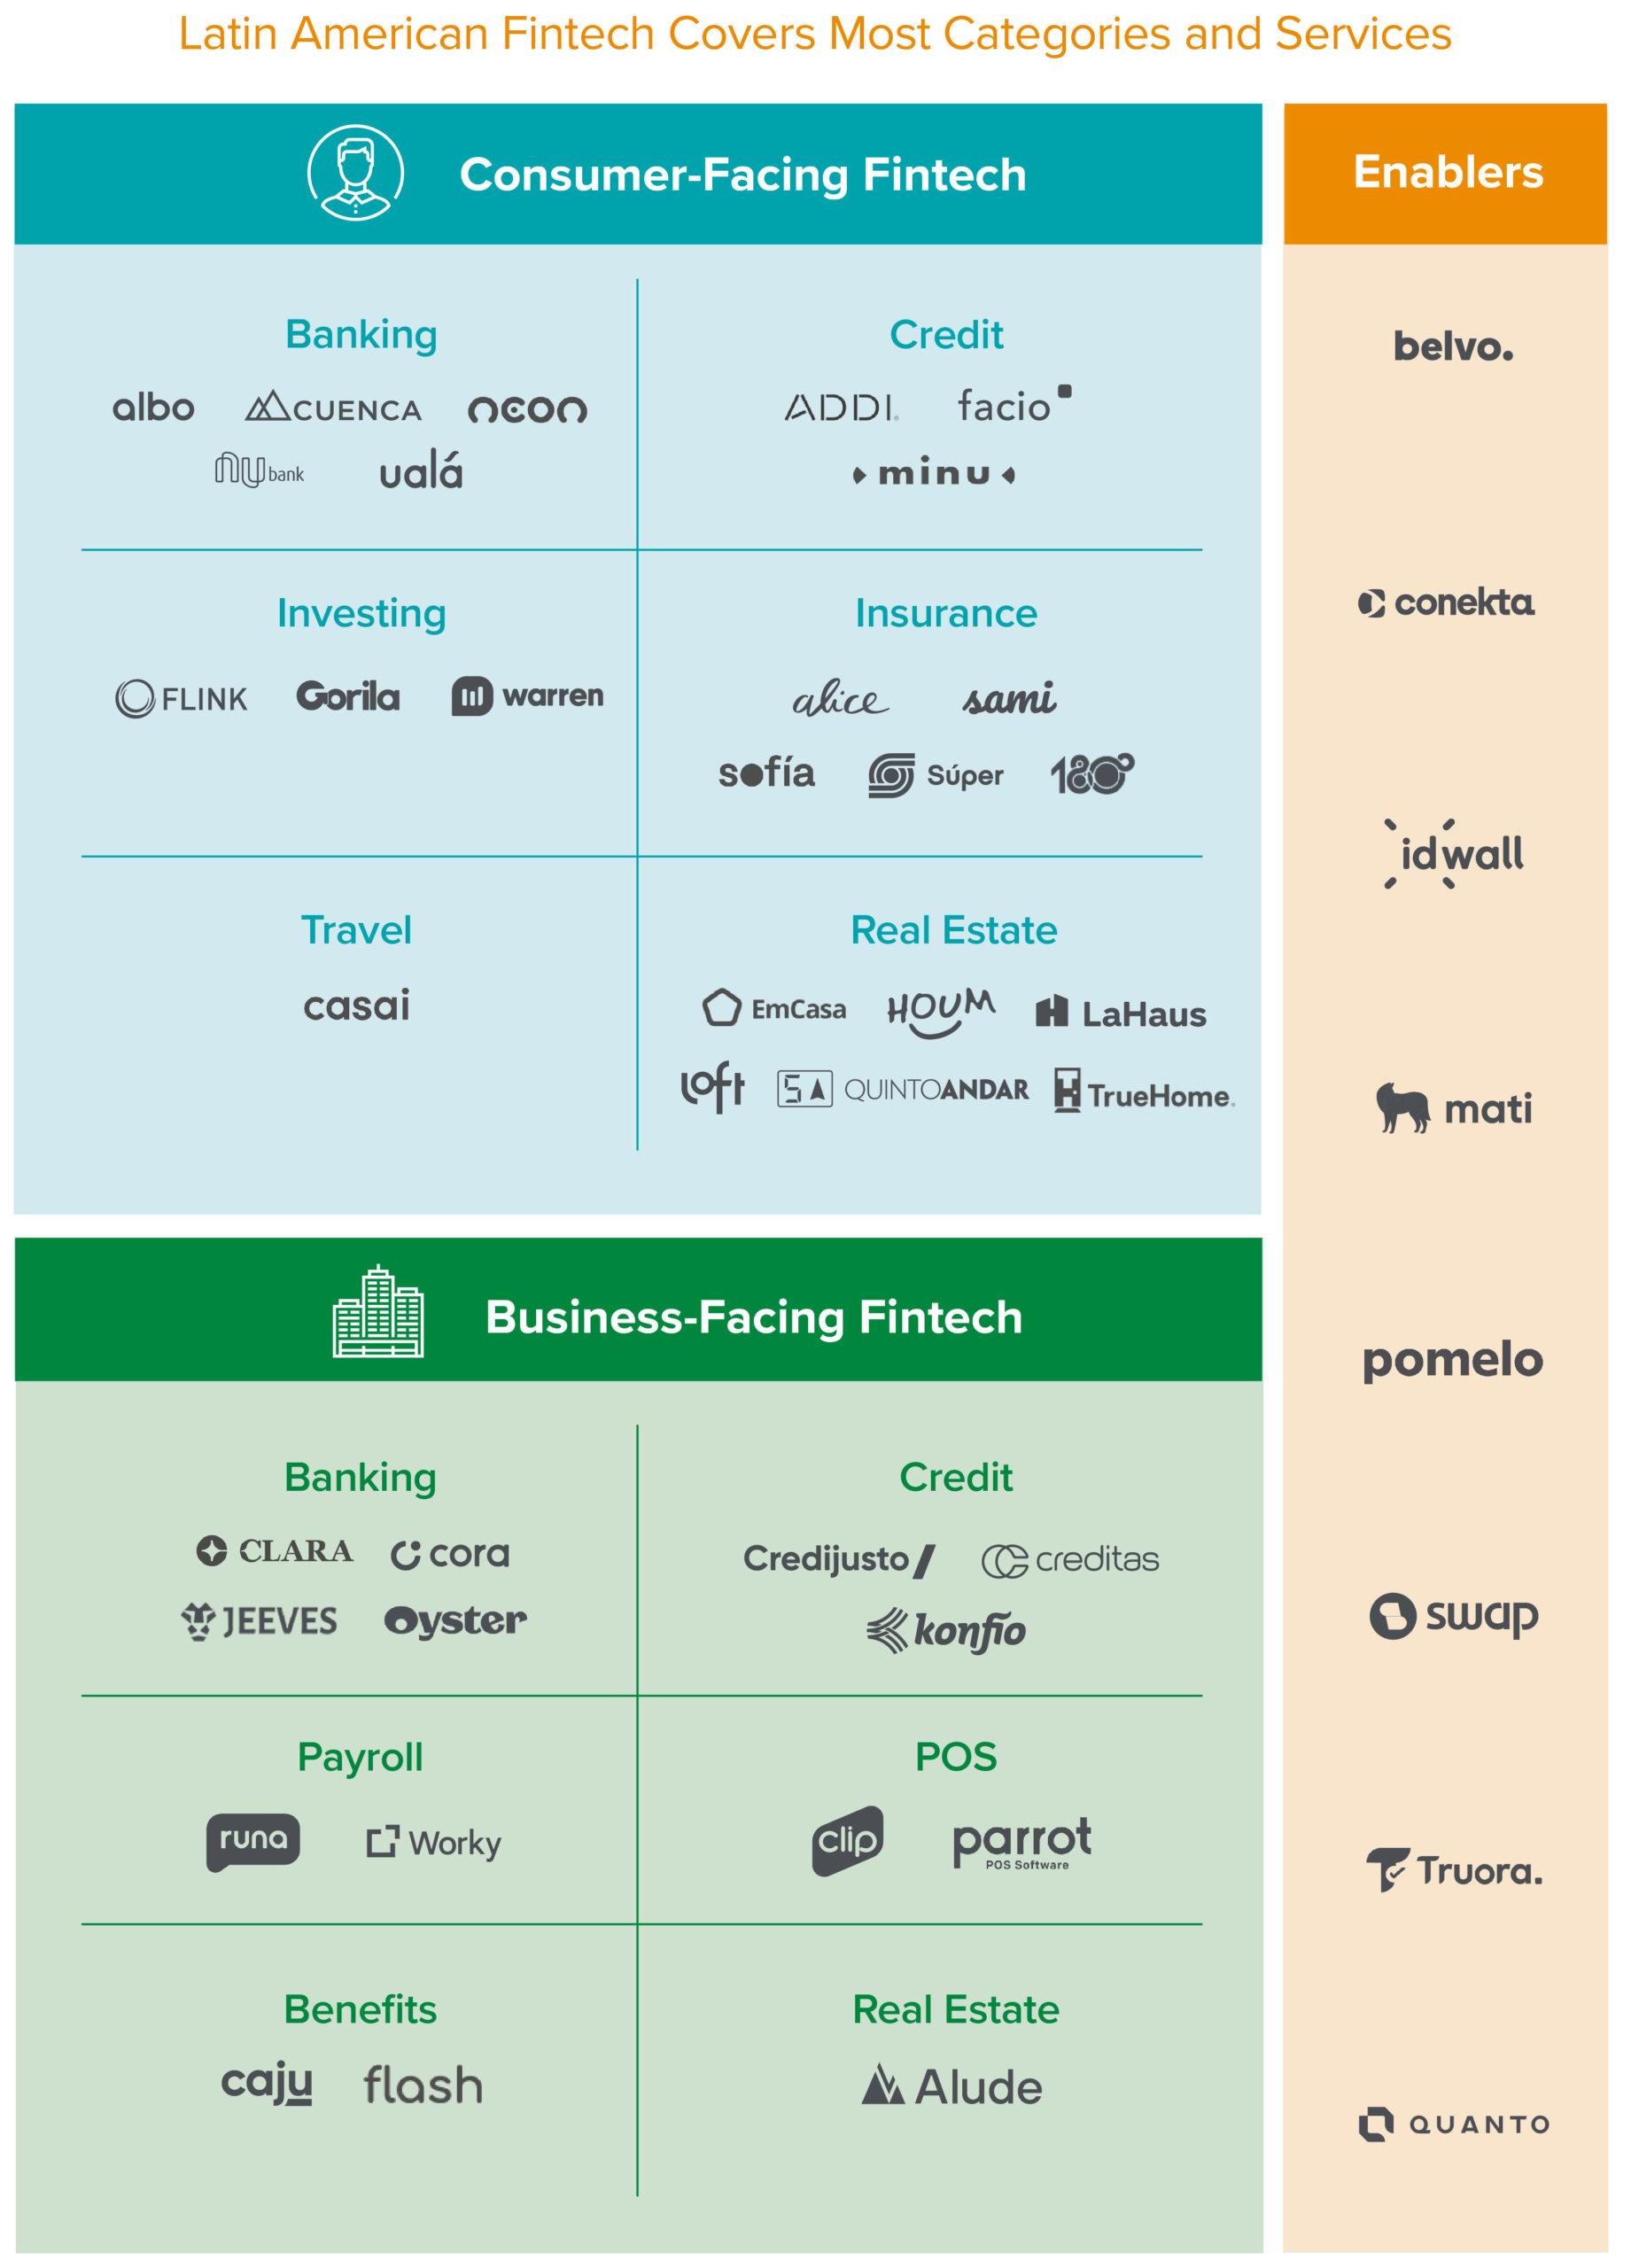 Latin America Fintech boom